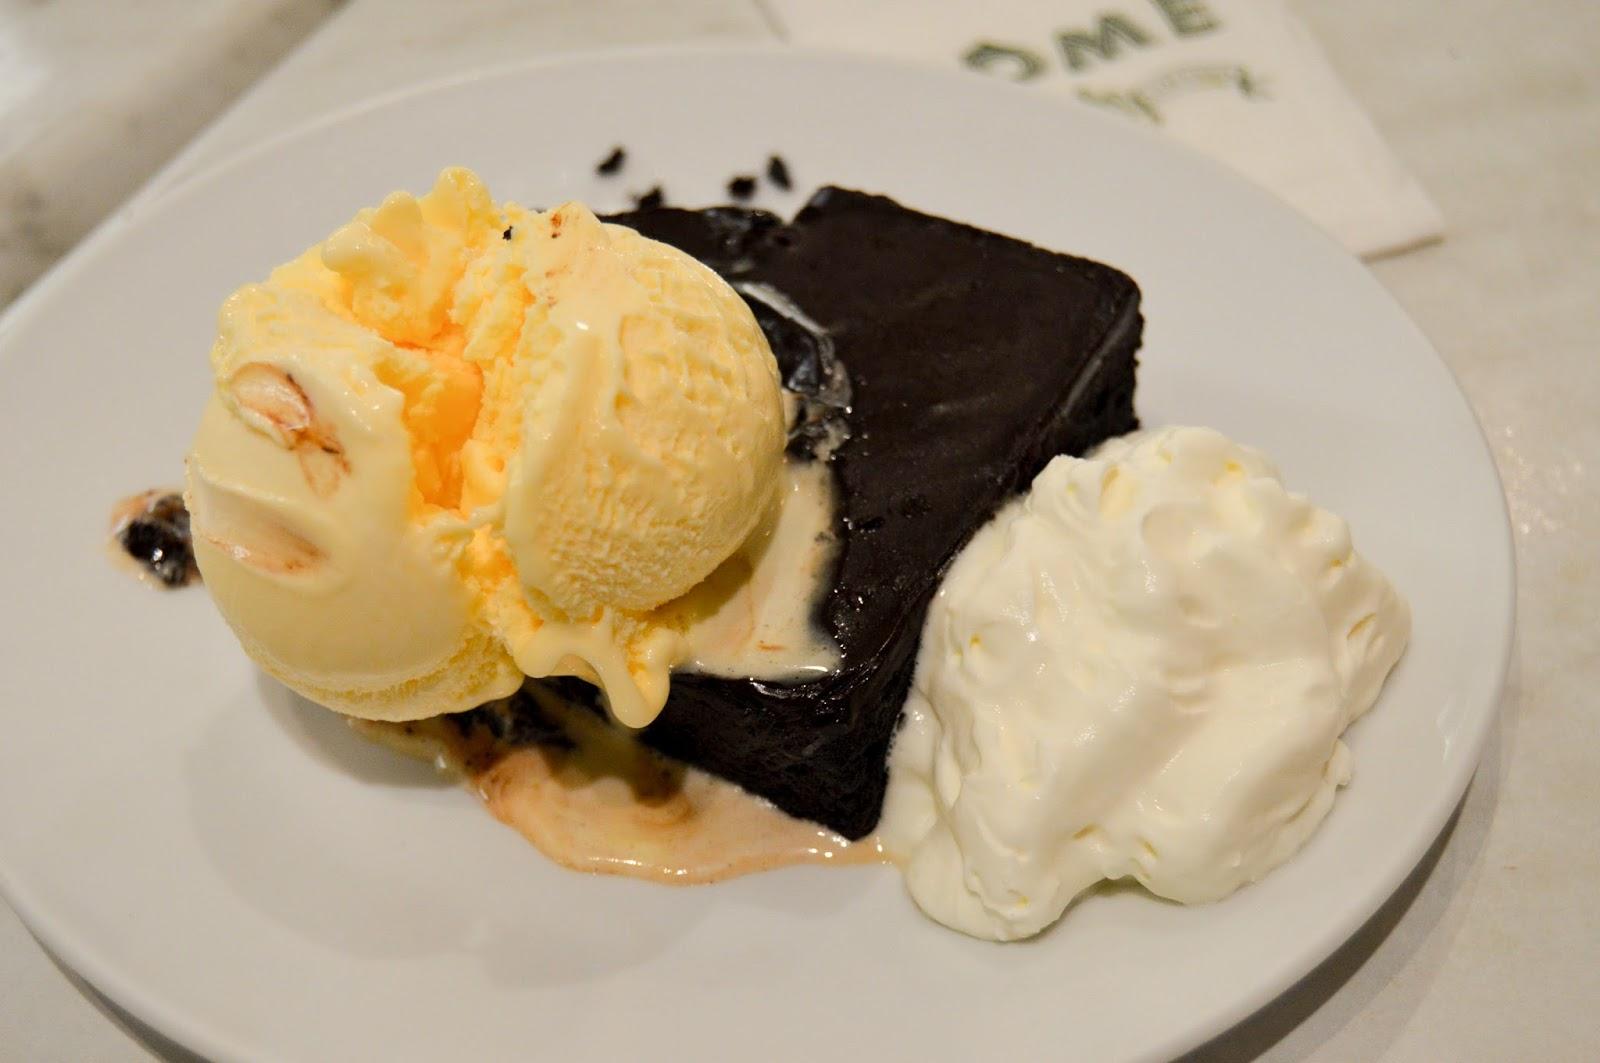 Chocolate Mango & Vanilla Ice Cream Free Stock Photos